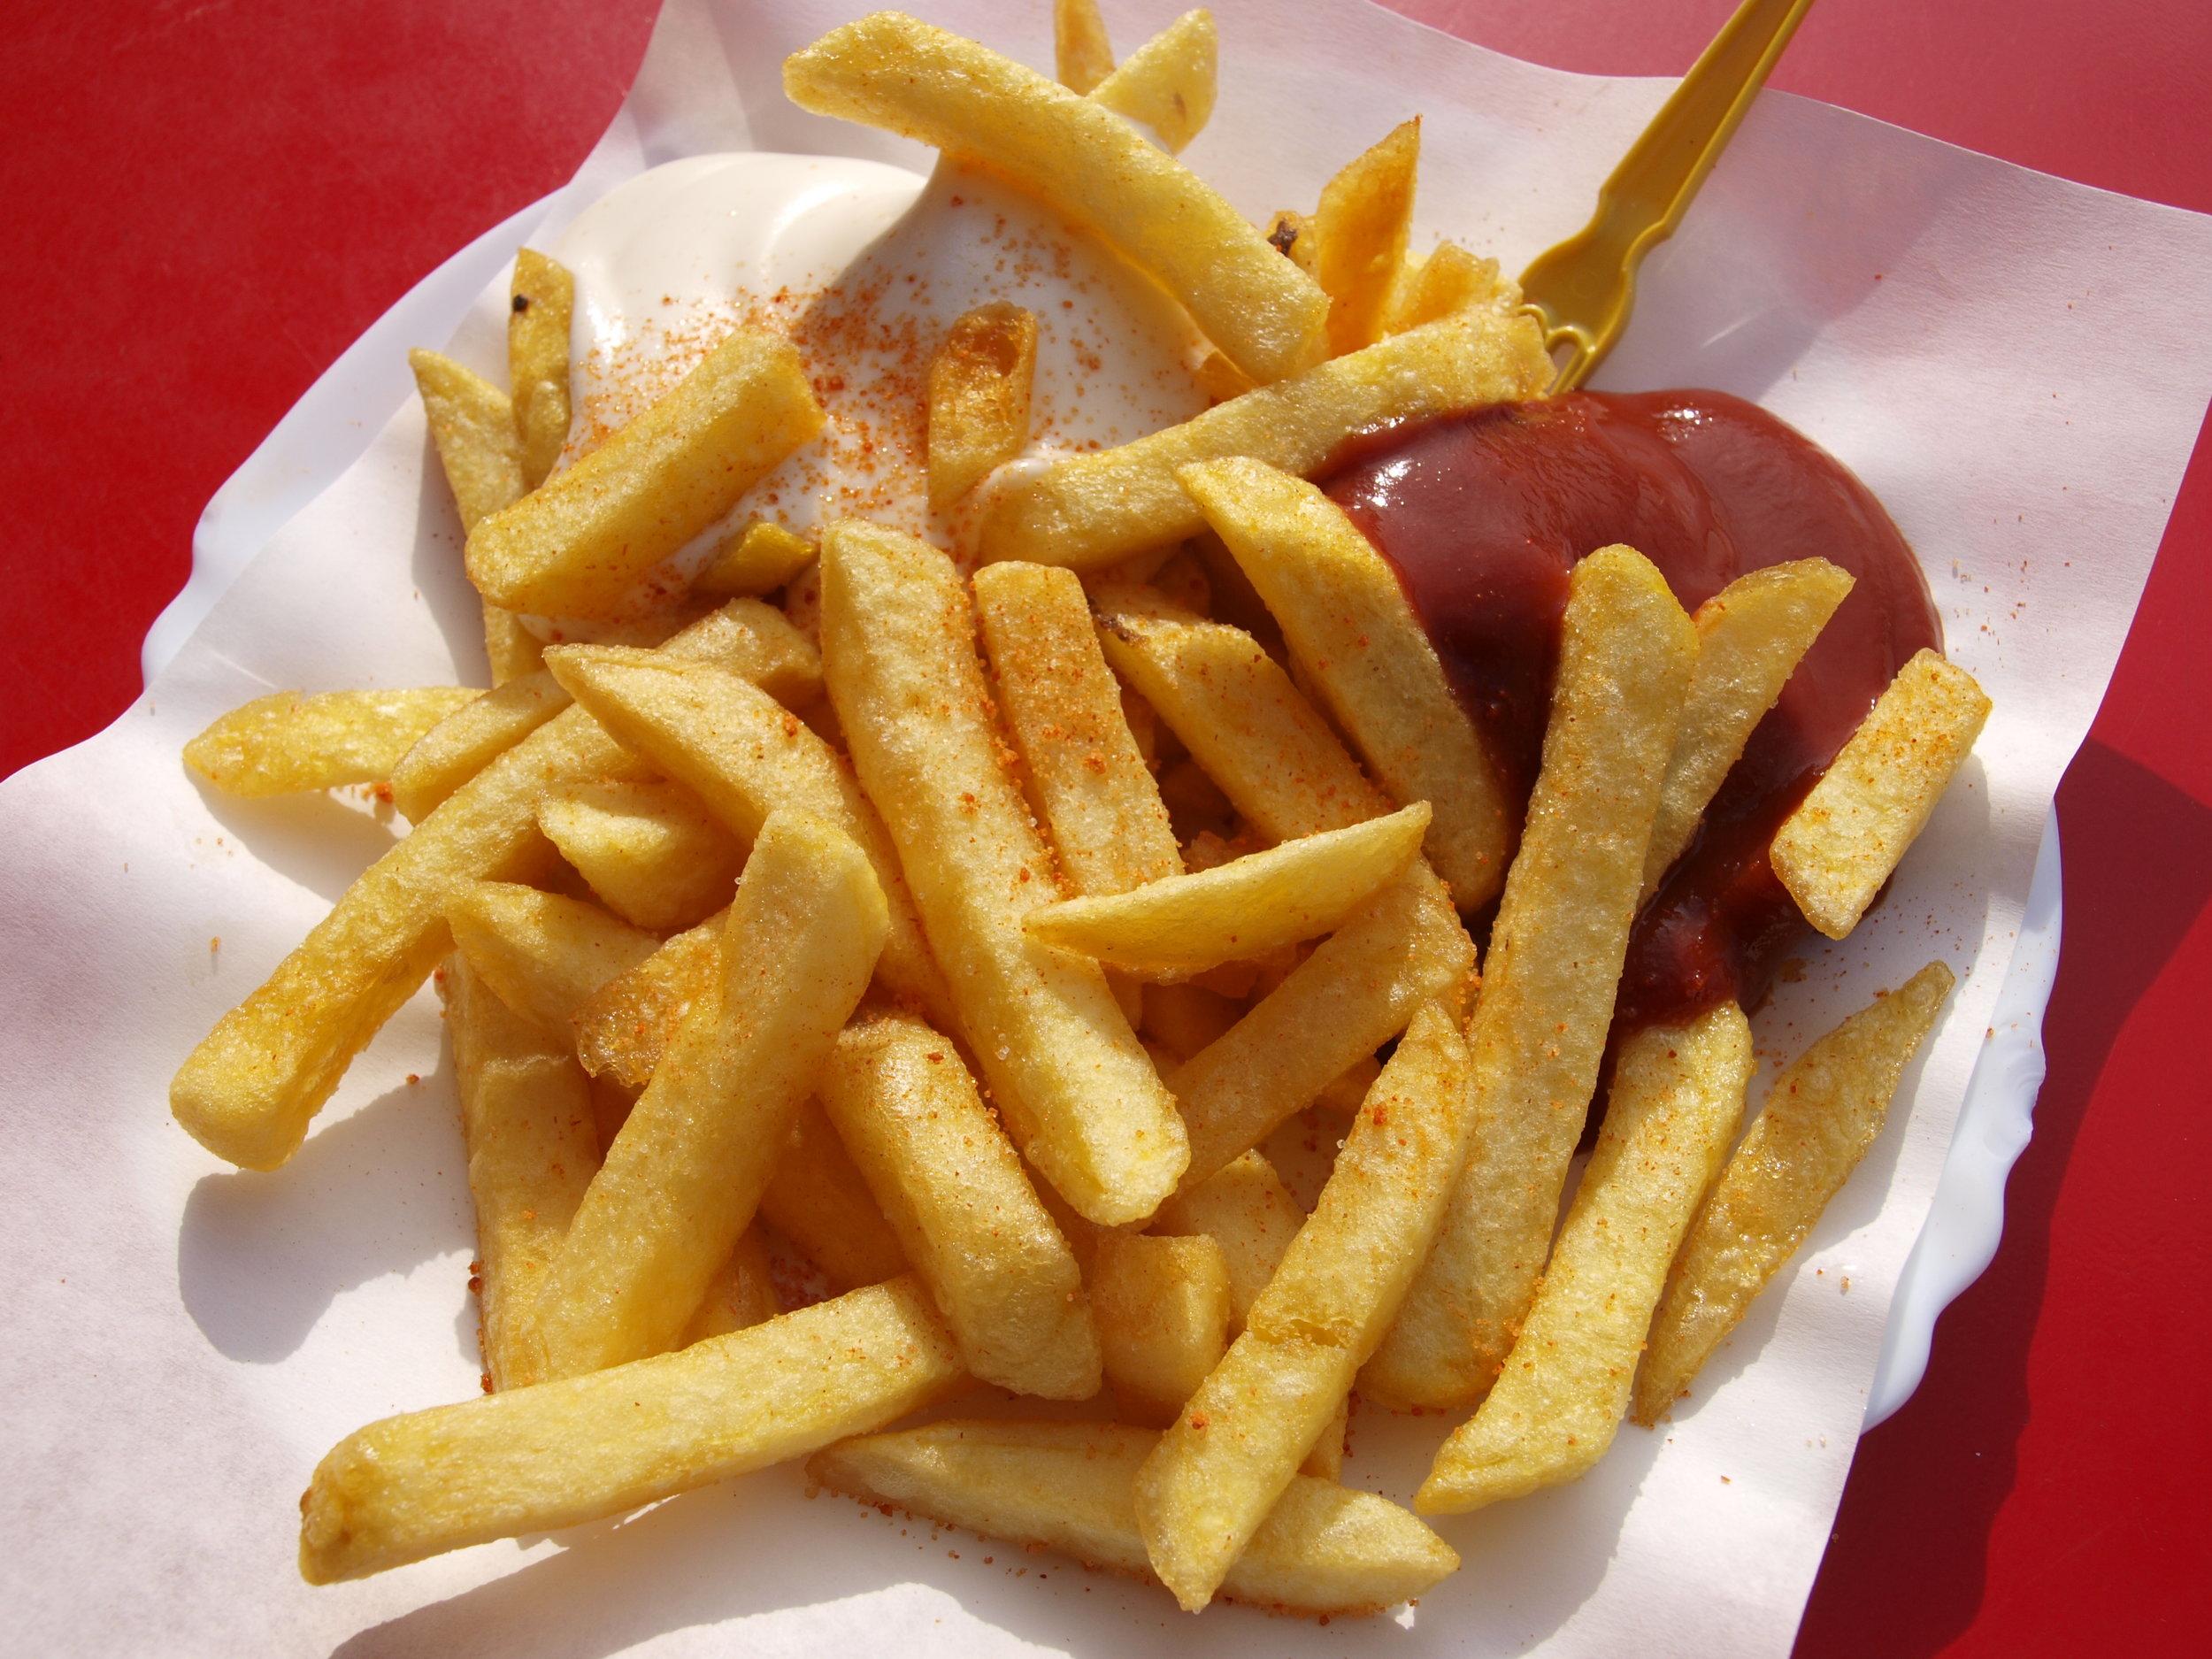 fries.jpeg